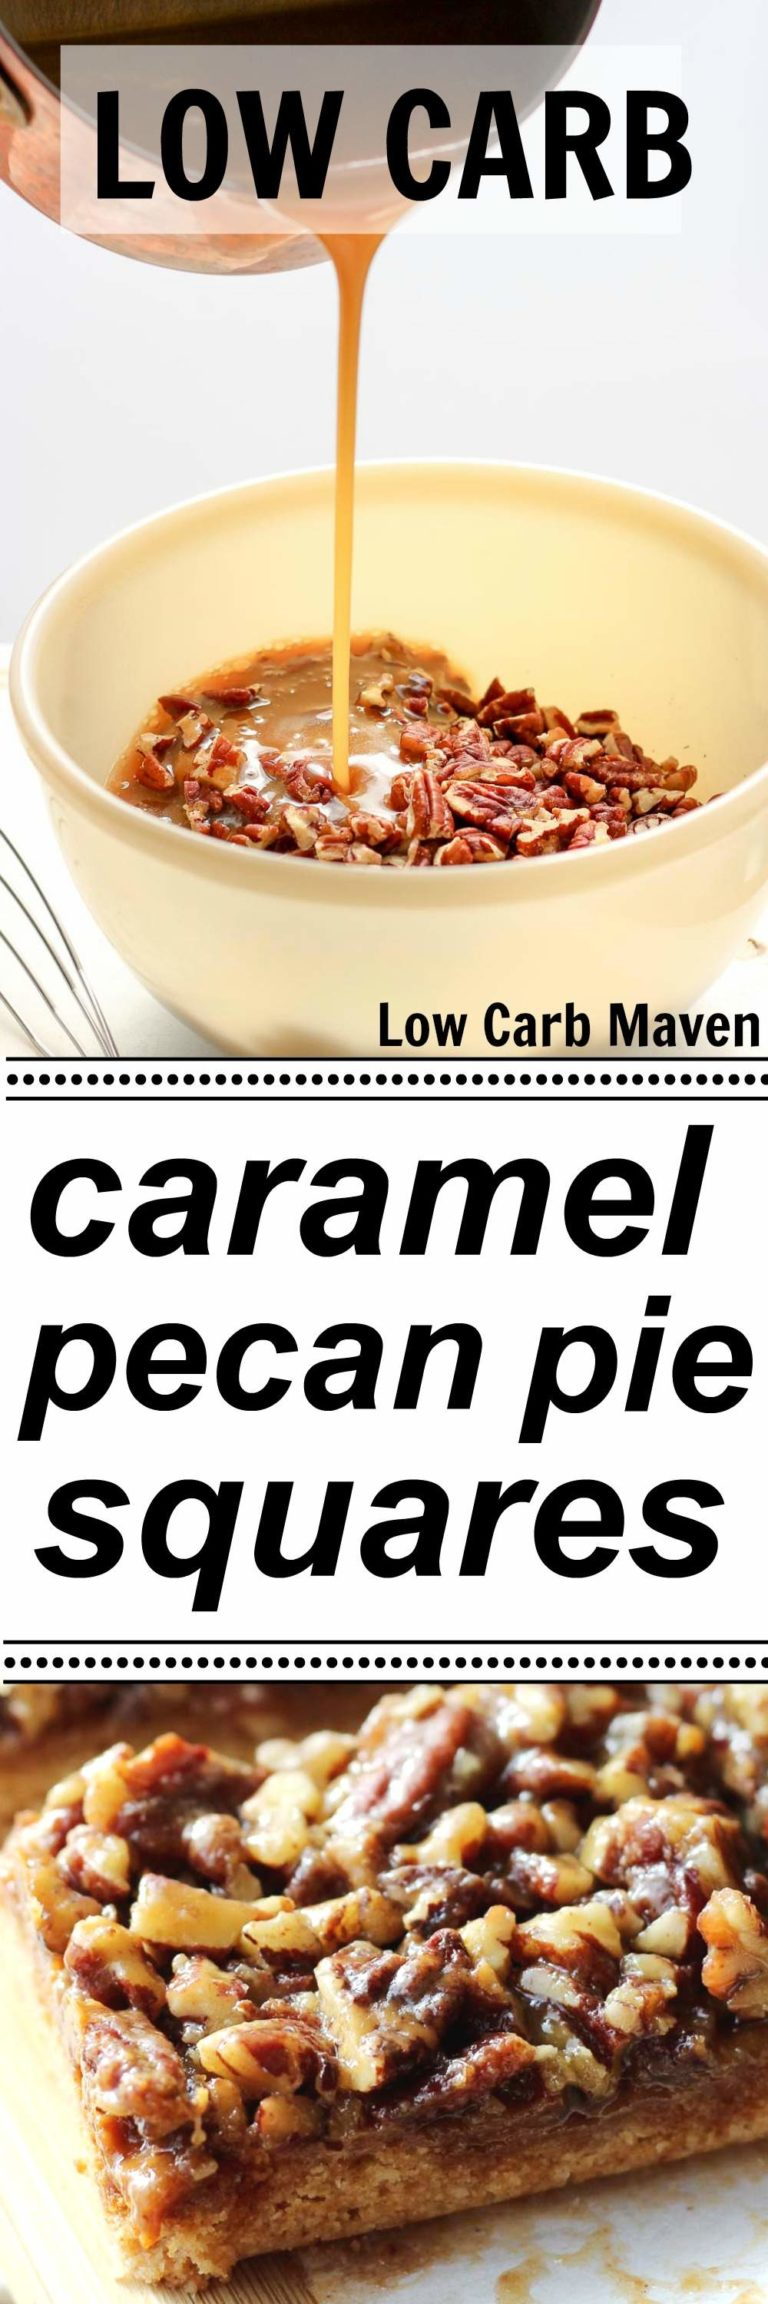 Low Carb Pecan Pie Bars (sugar-free)